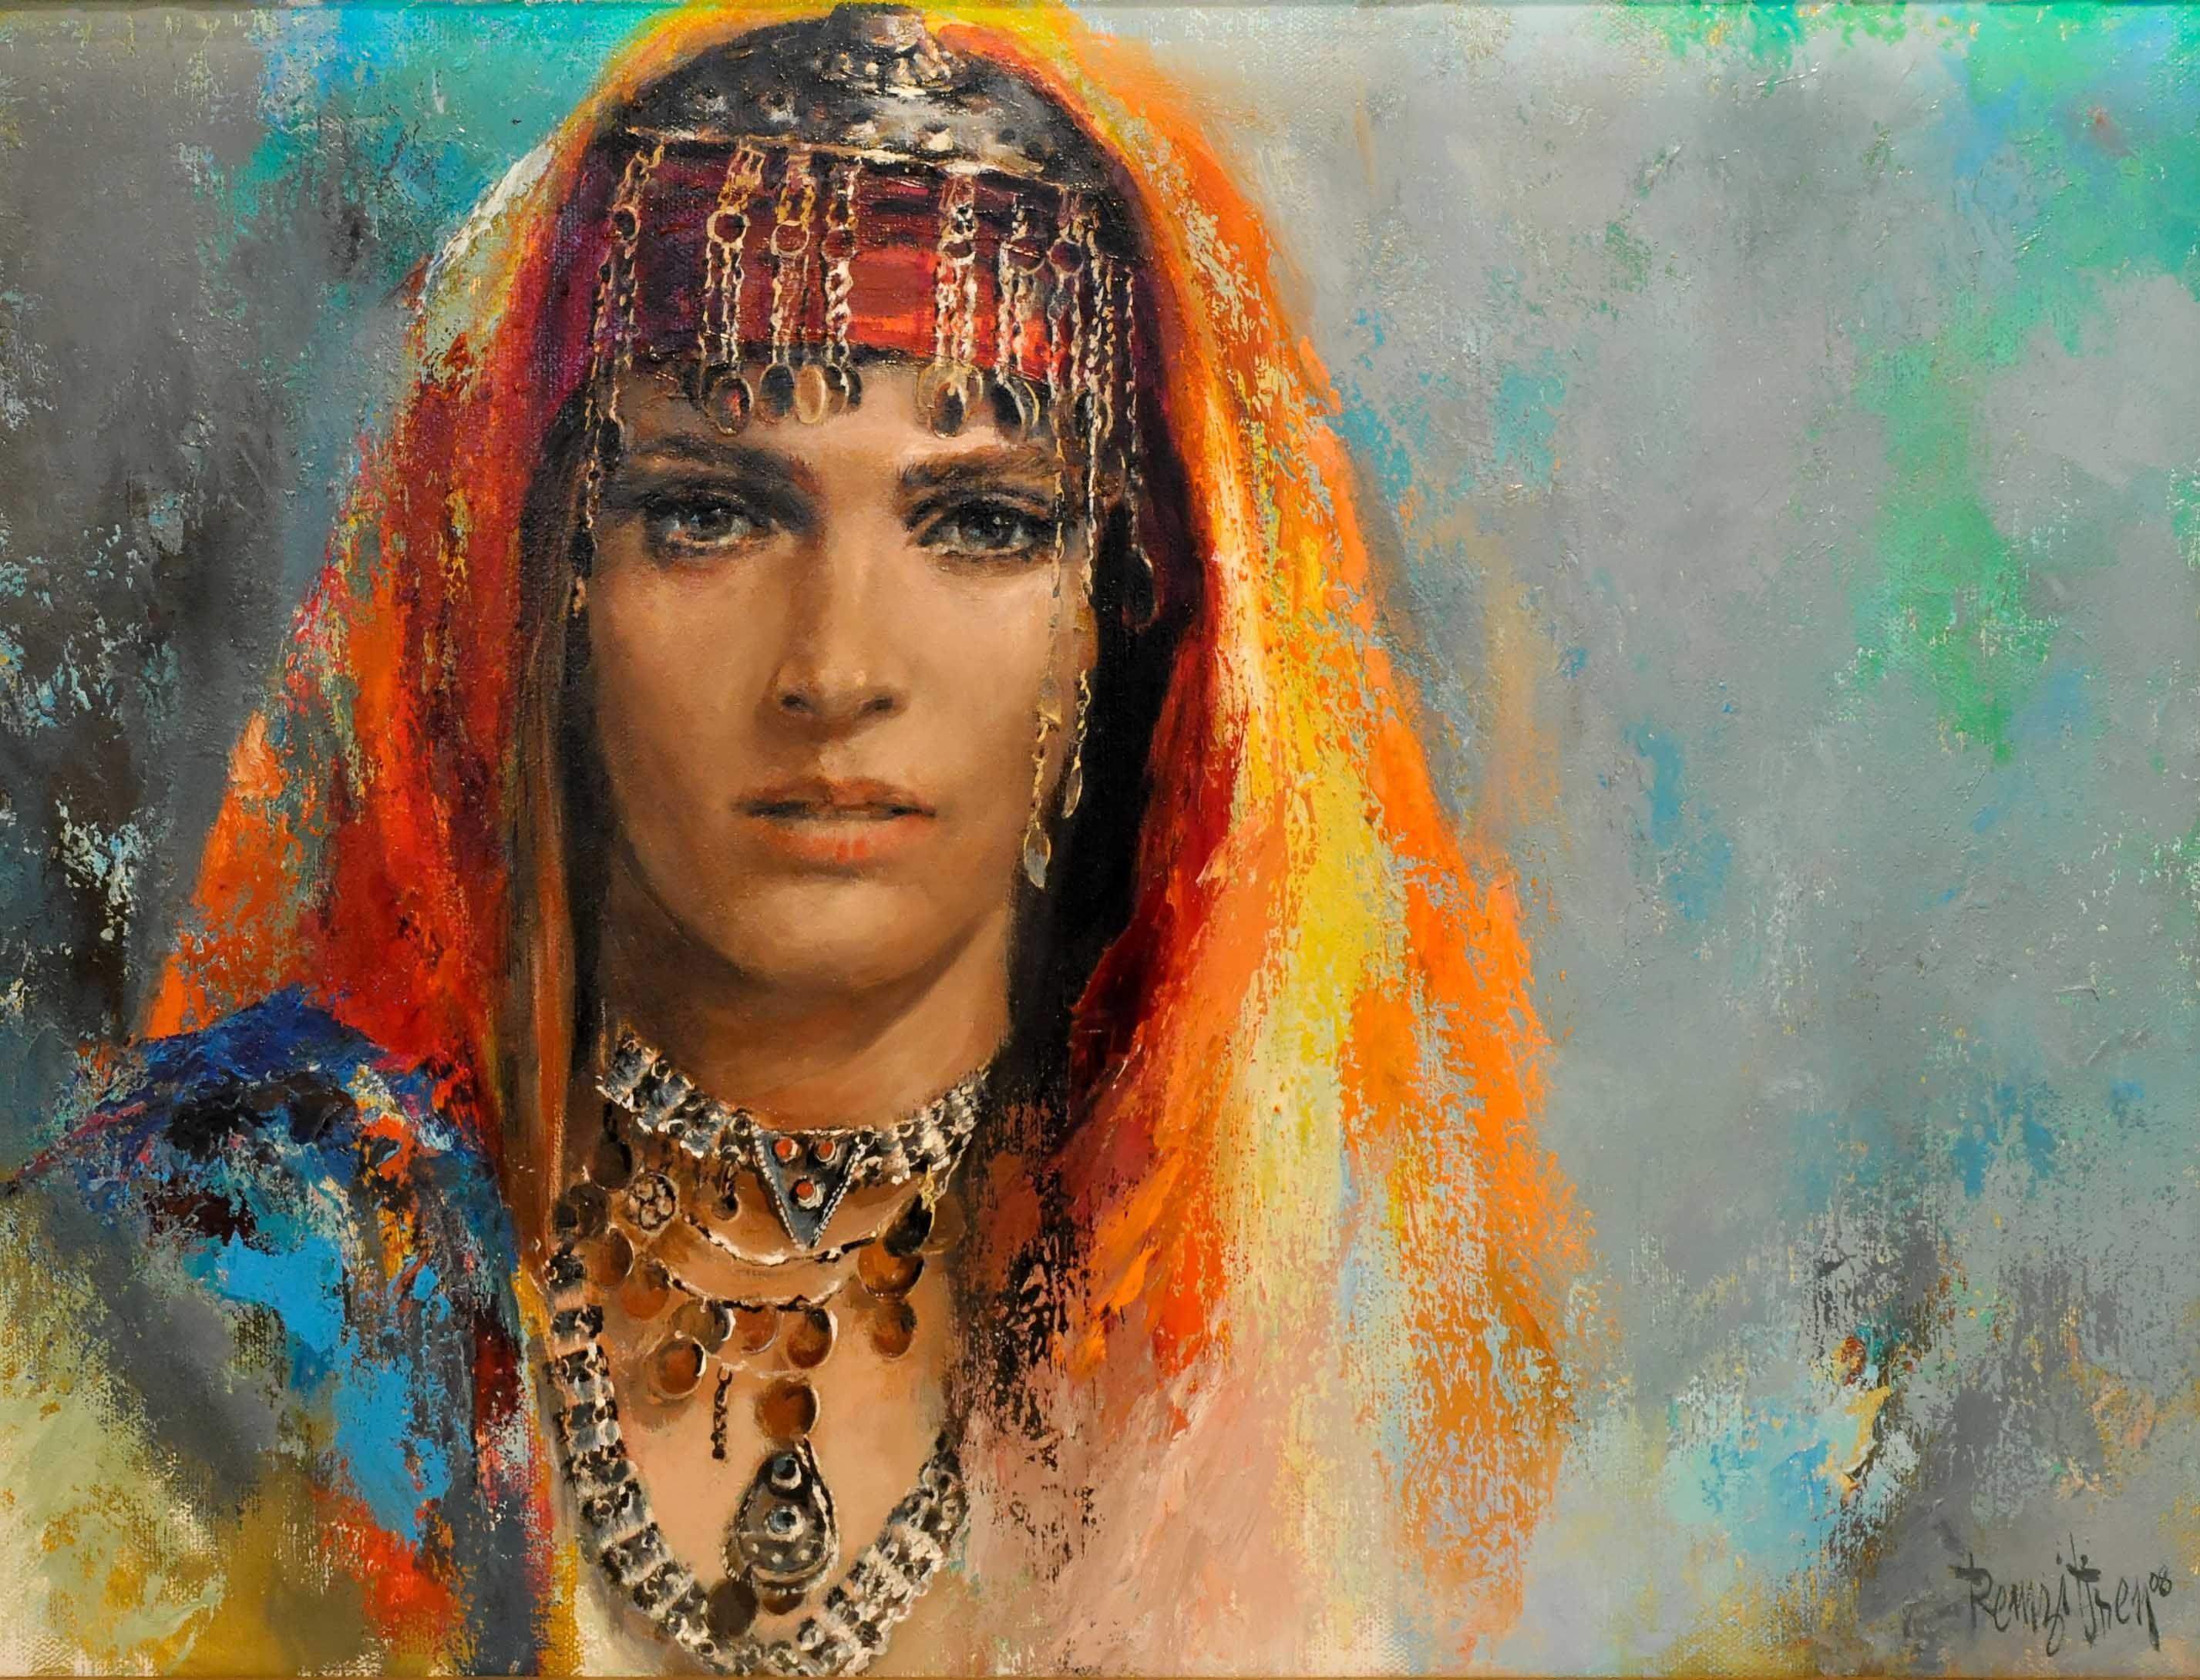 arabian women схема вышивки